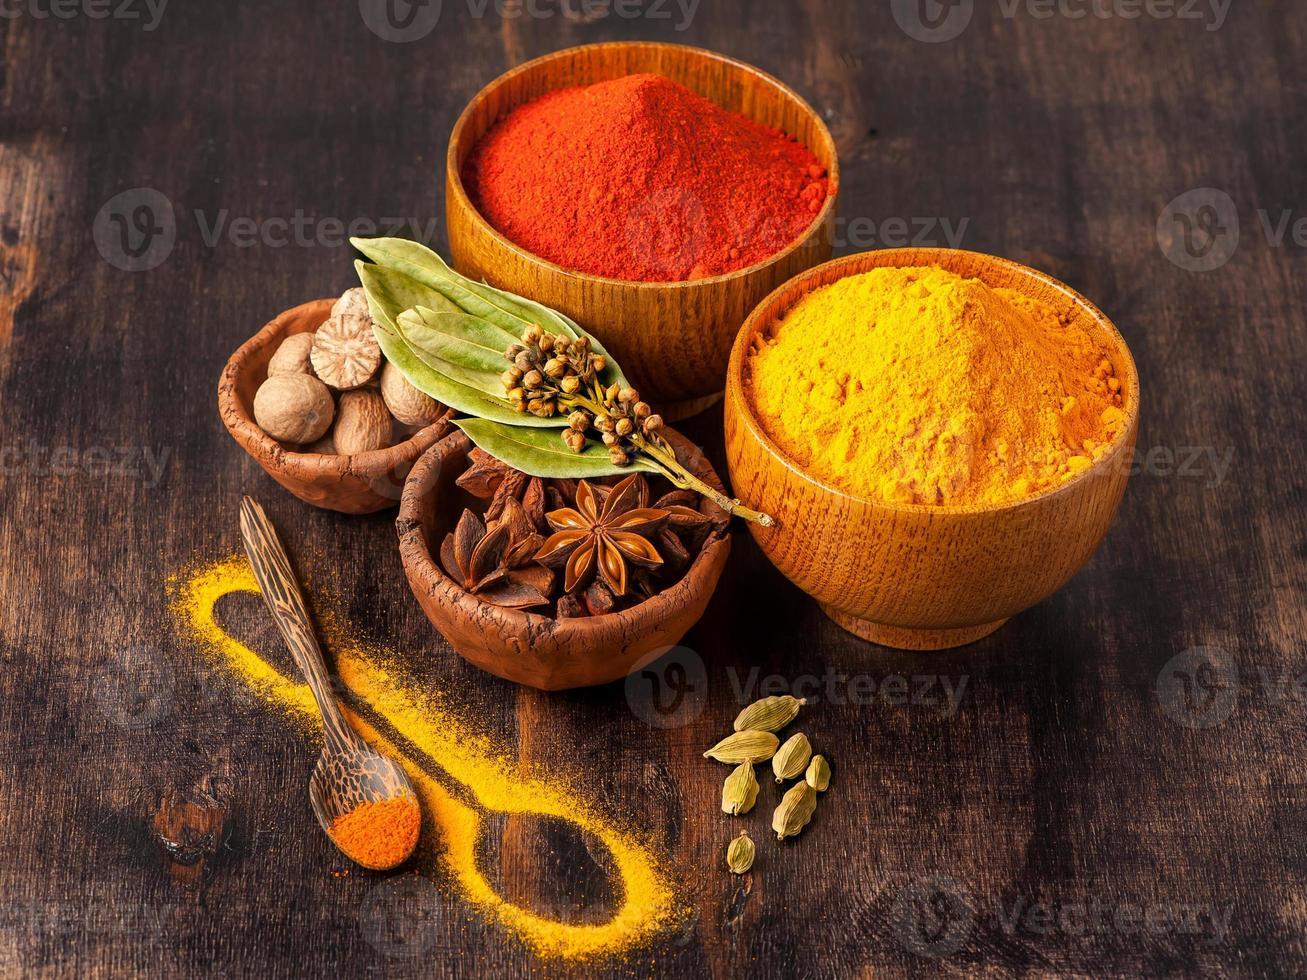 Spices curry, paprika, nutmeg, star anise, cardamom. photo